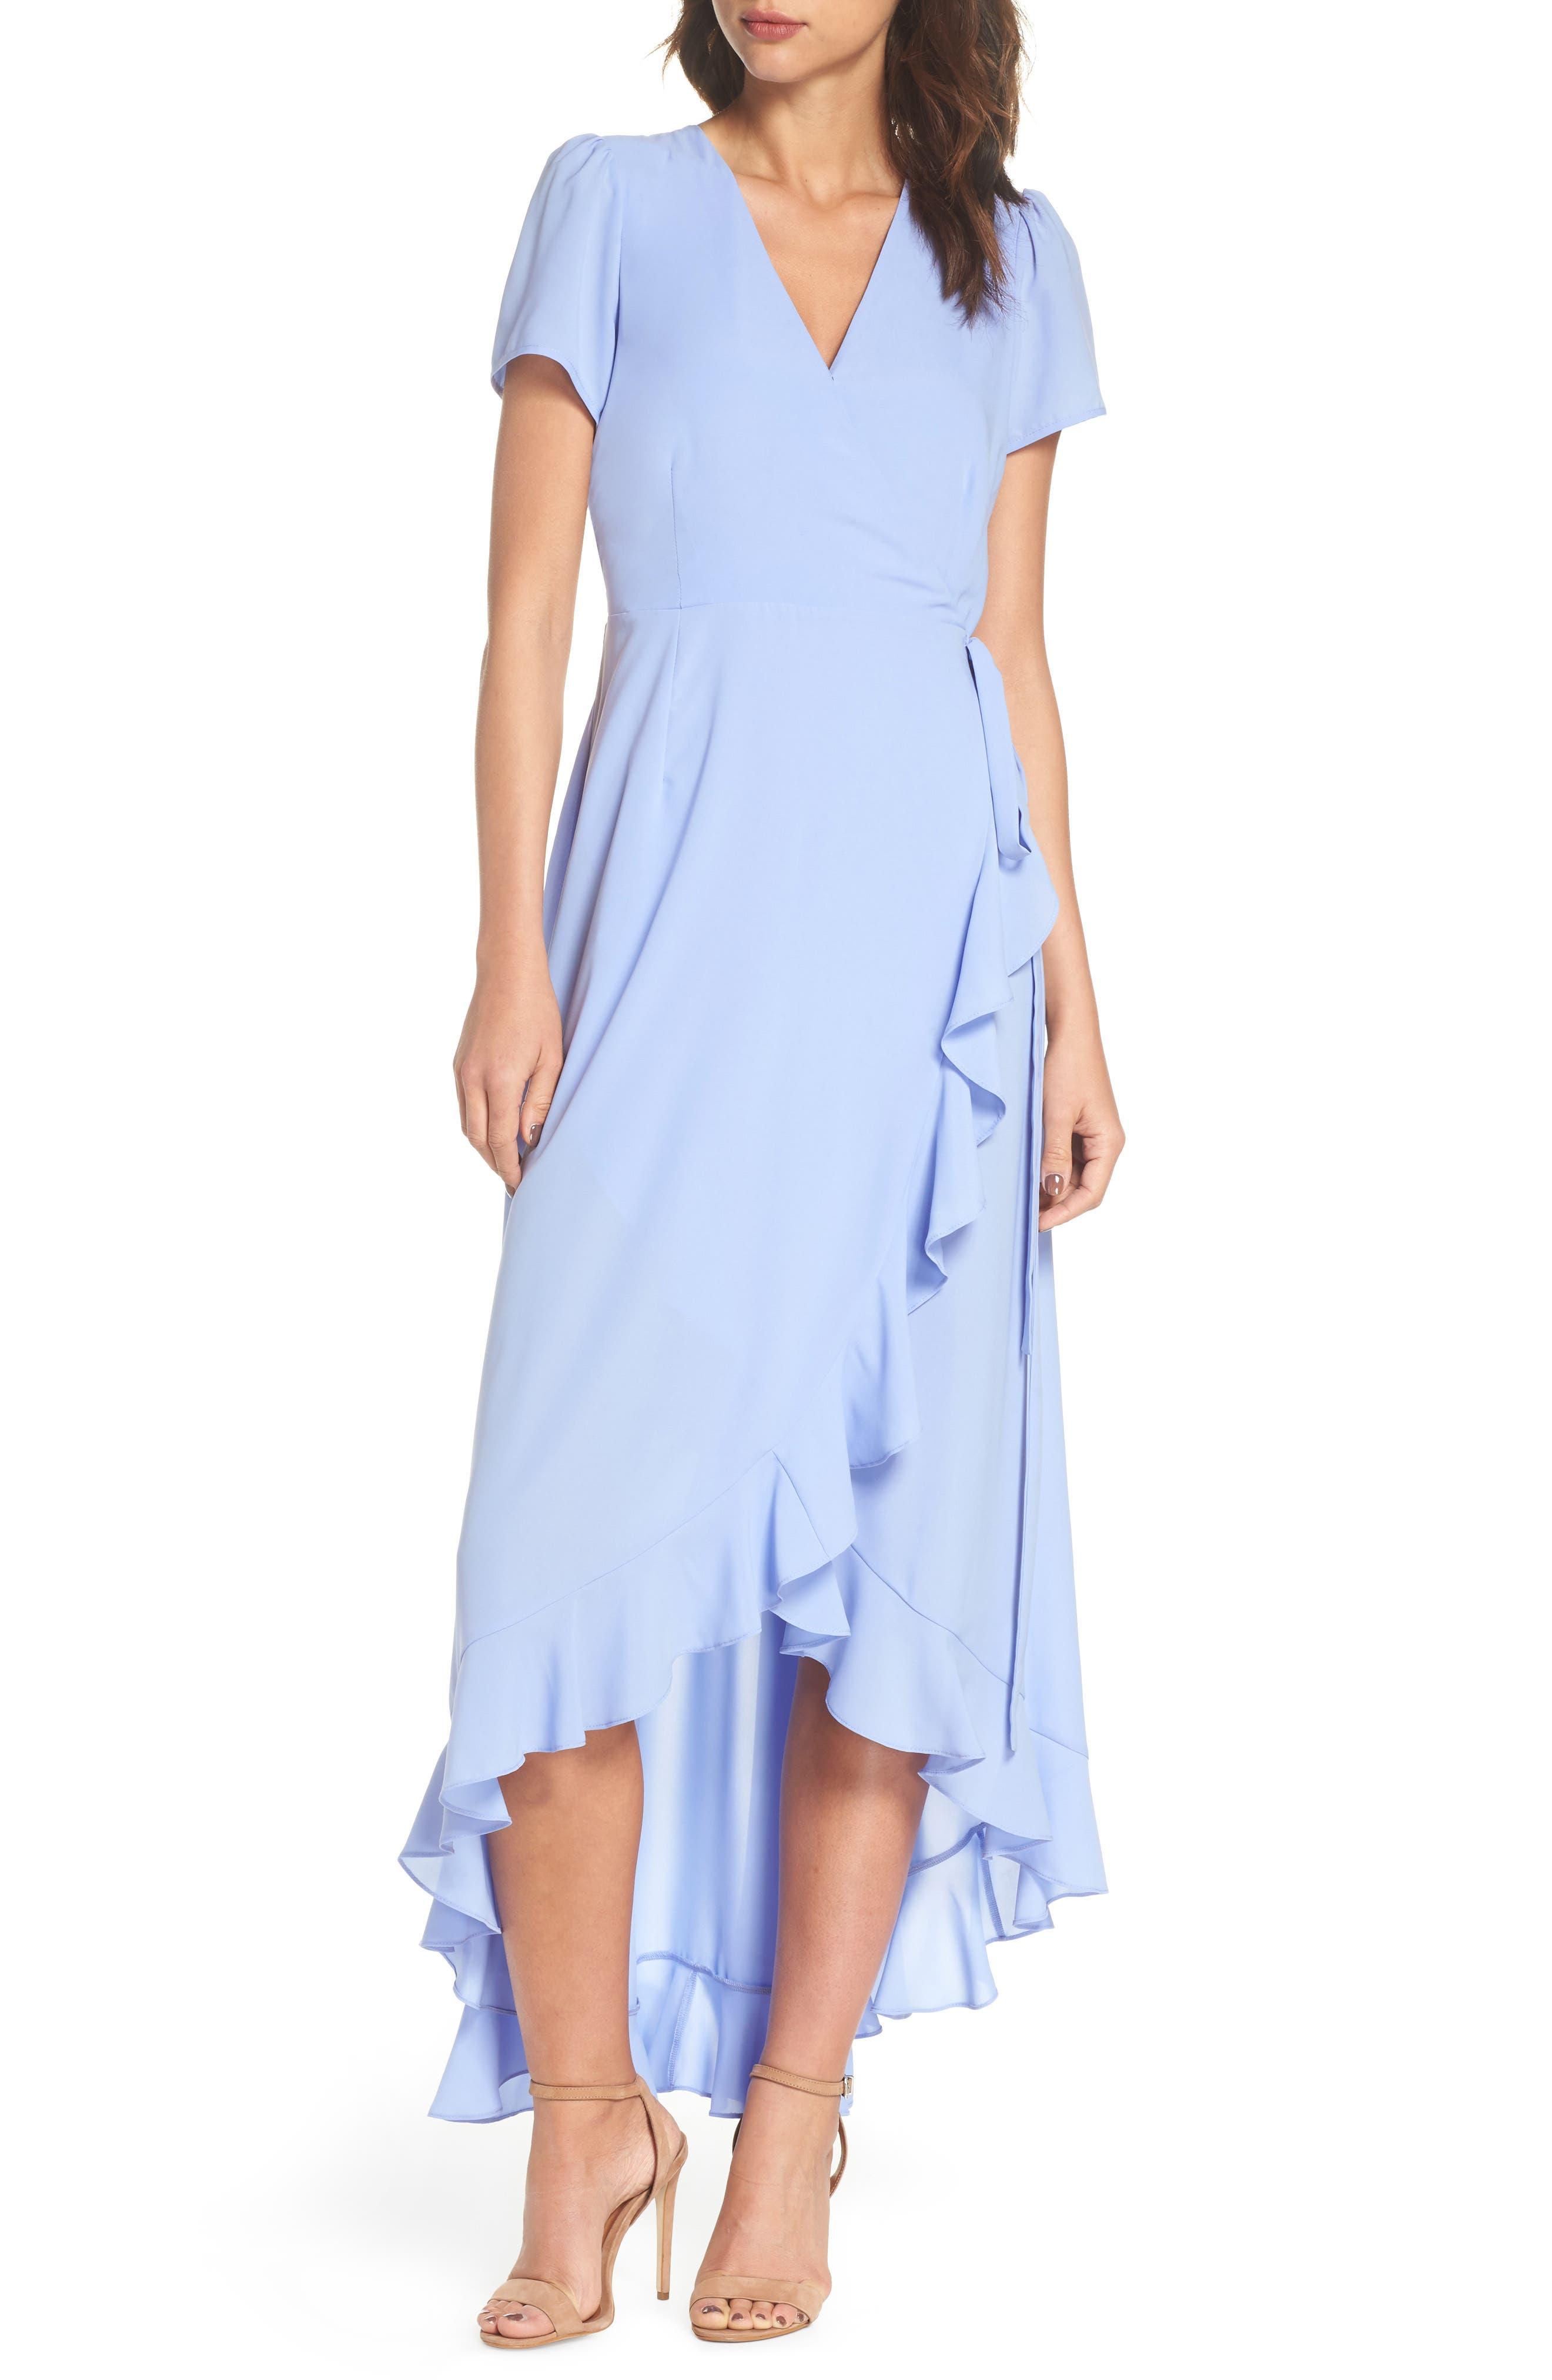 Main Image - Felicity & Coco Madge Ruffle Wrap Maxi Dress (Regular & Petite) (Nordstrom Exclusive)